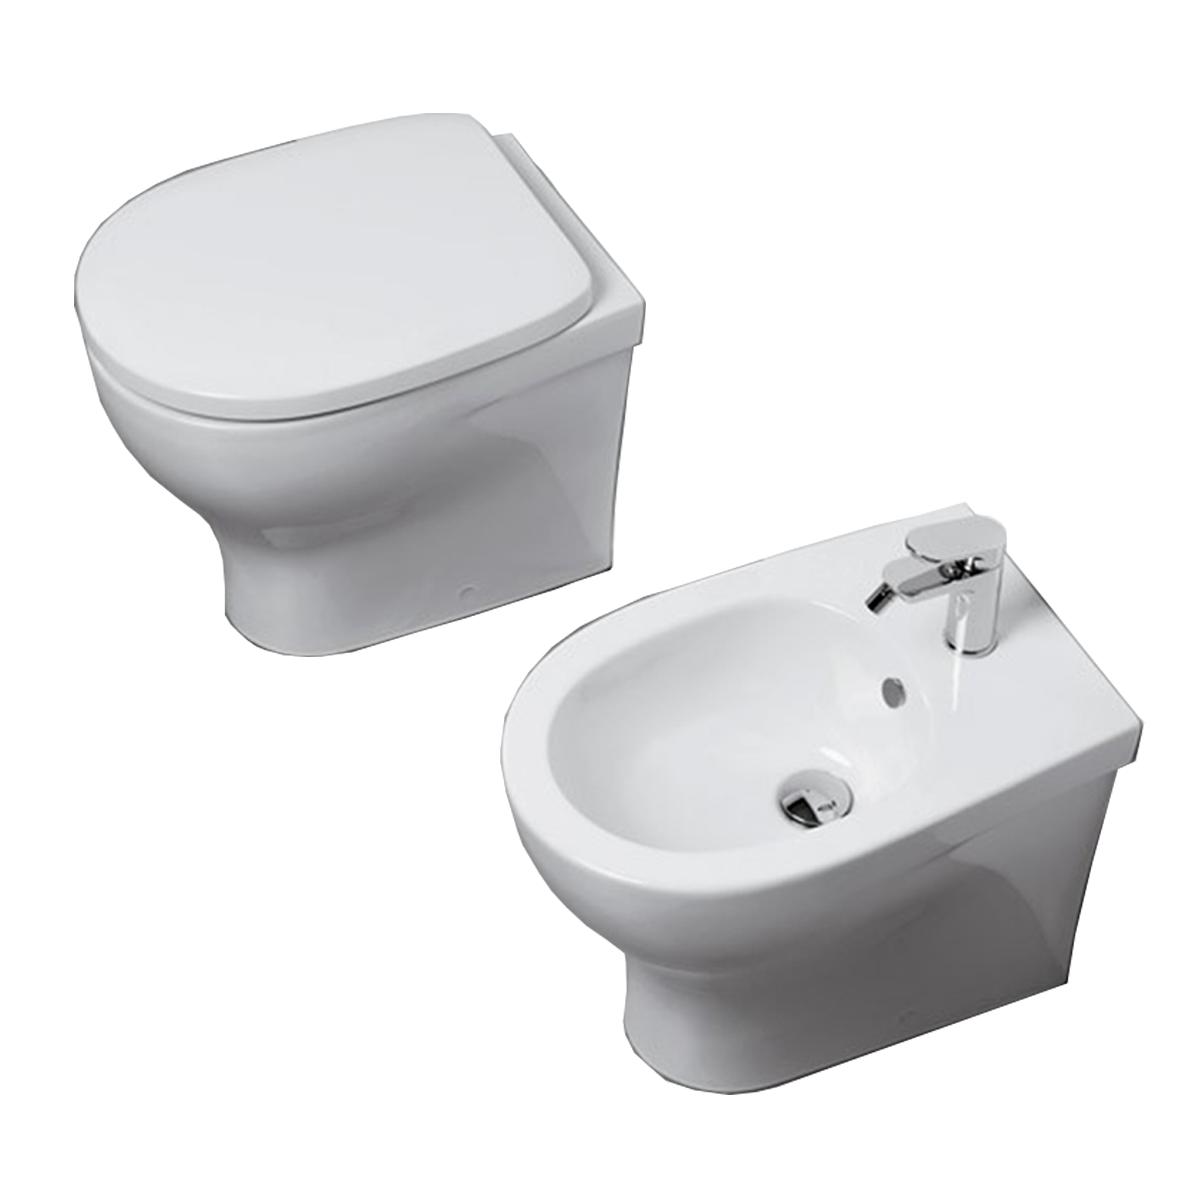 Sanitari Filo parete Pratica Ceramica Azzurra WC + BIDET + SEDILE in OFFERTA filo muro